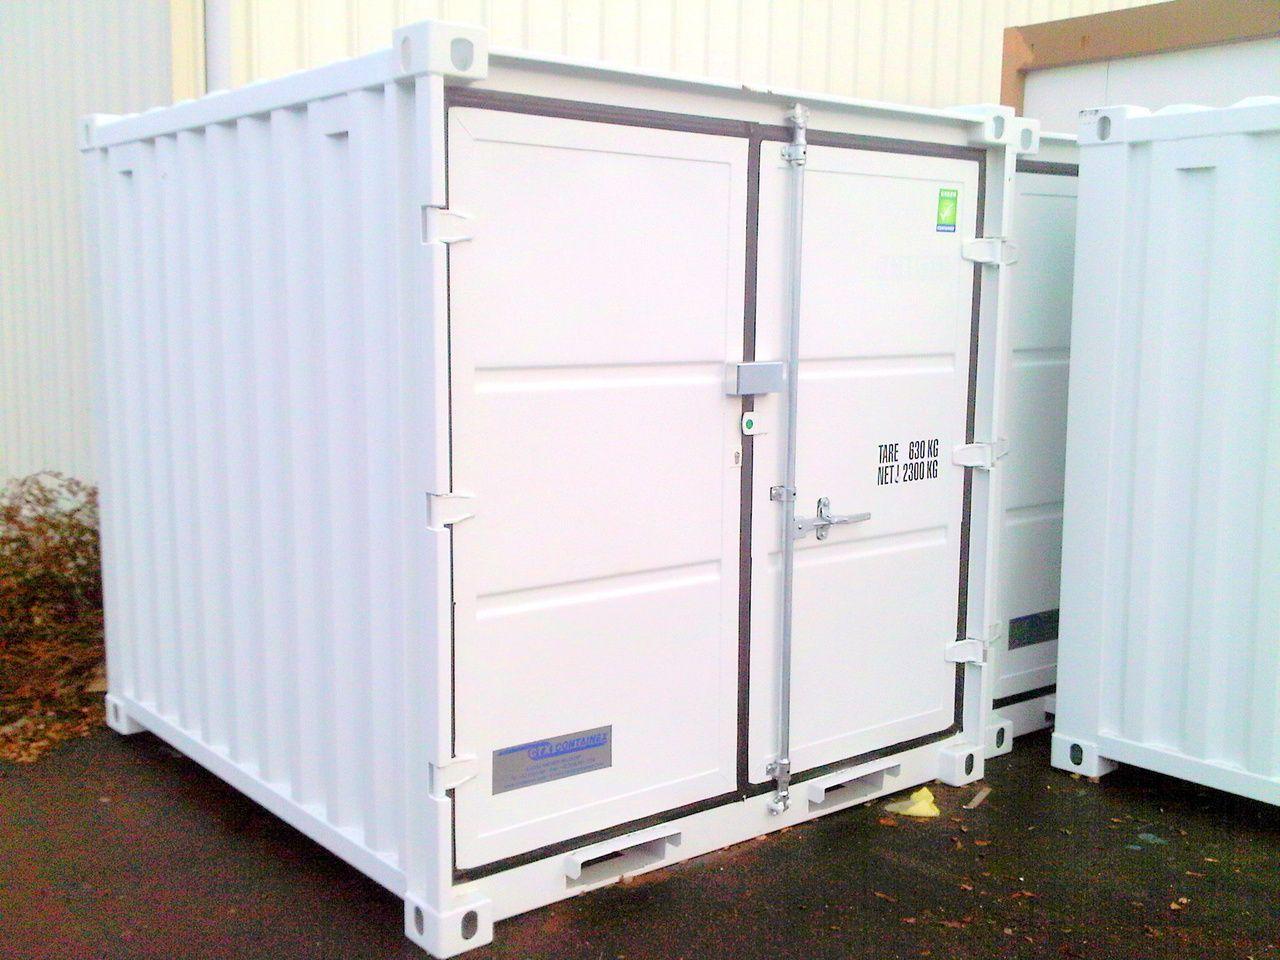 Container stockage 6 pieds , conteneur 6 pieds, container 6ft, conteneur perpignan, container perpignan